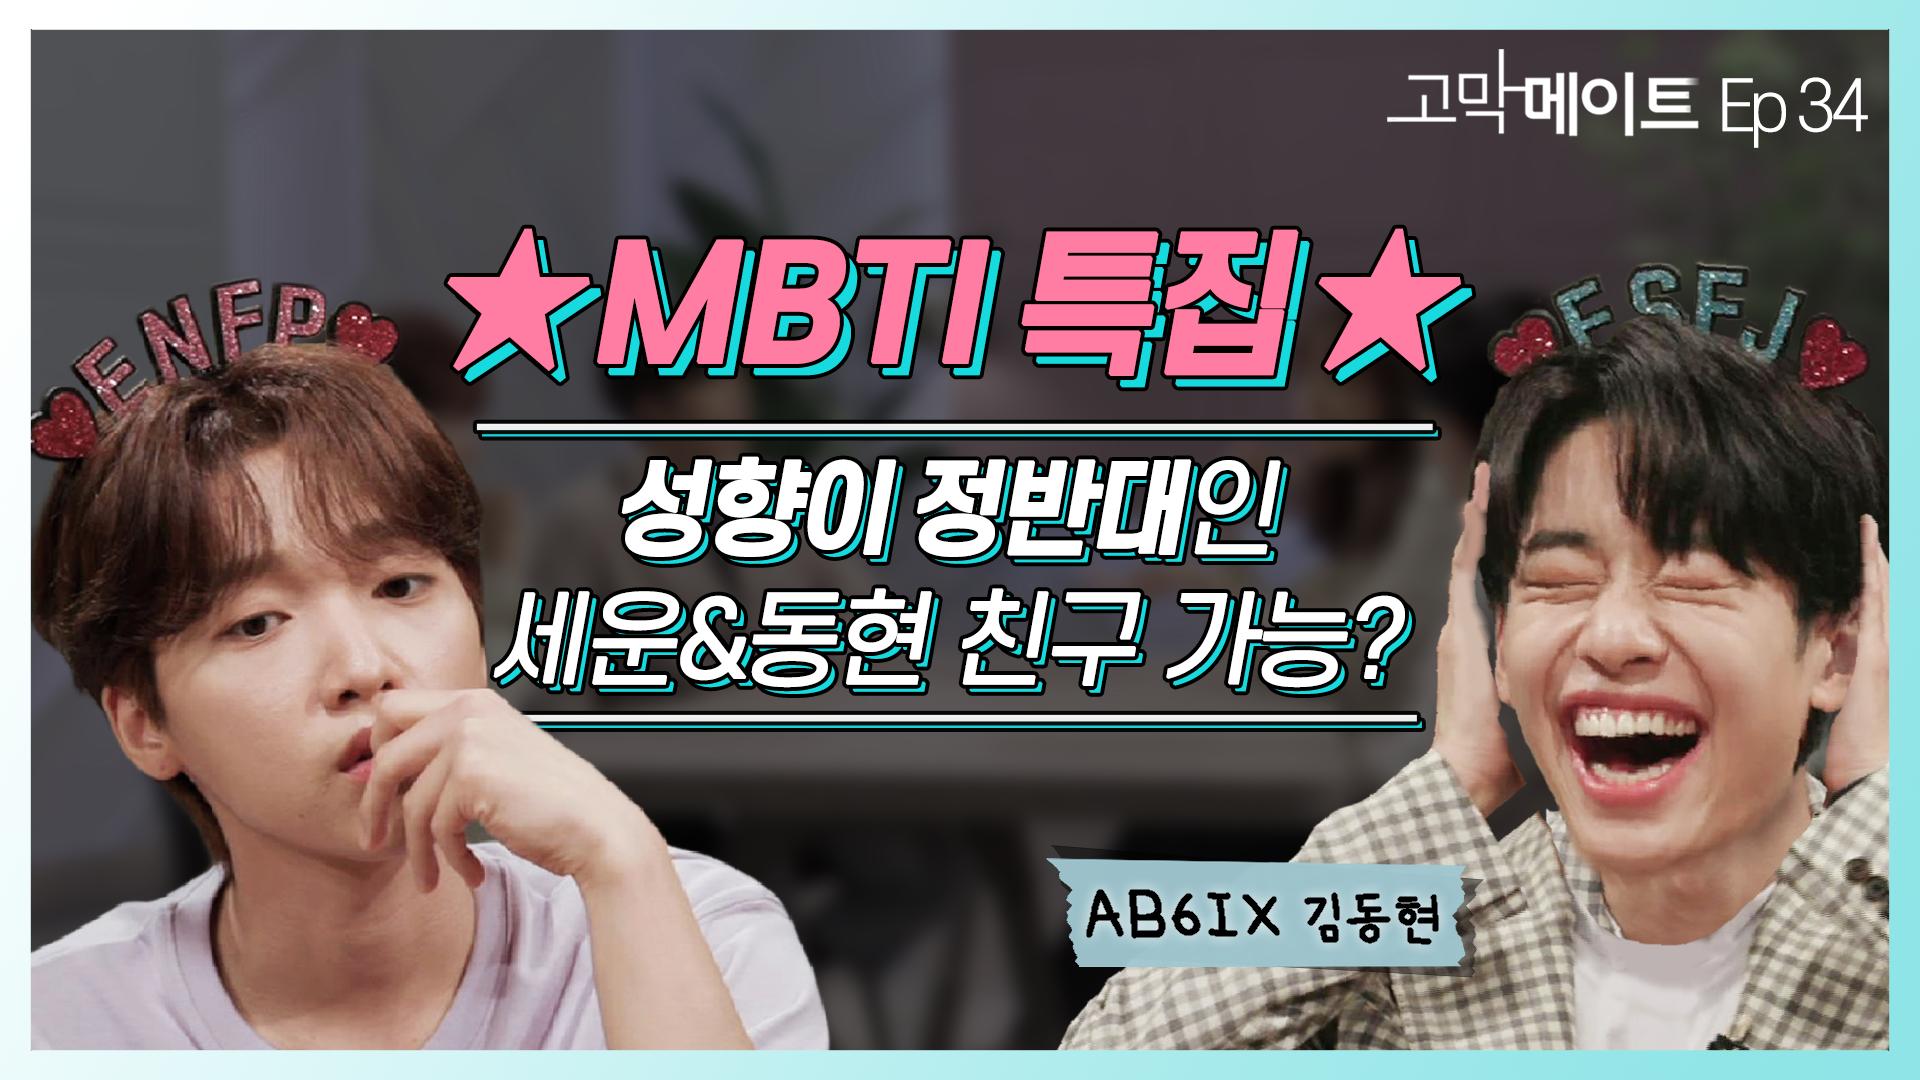 MBTI 특집: INFP의 슬기로운 사회생활|AB6IX 동현-흔·꽃·네·샴 (원곡: 장범준)<고막메이트>34회